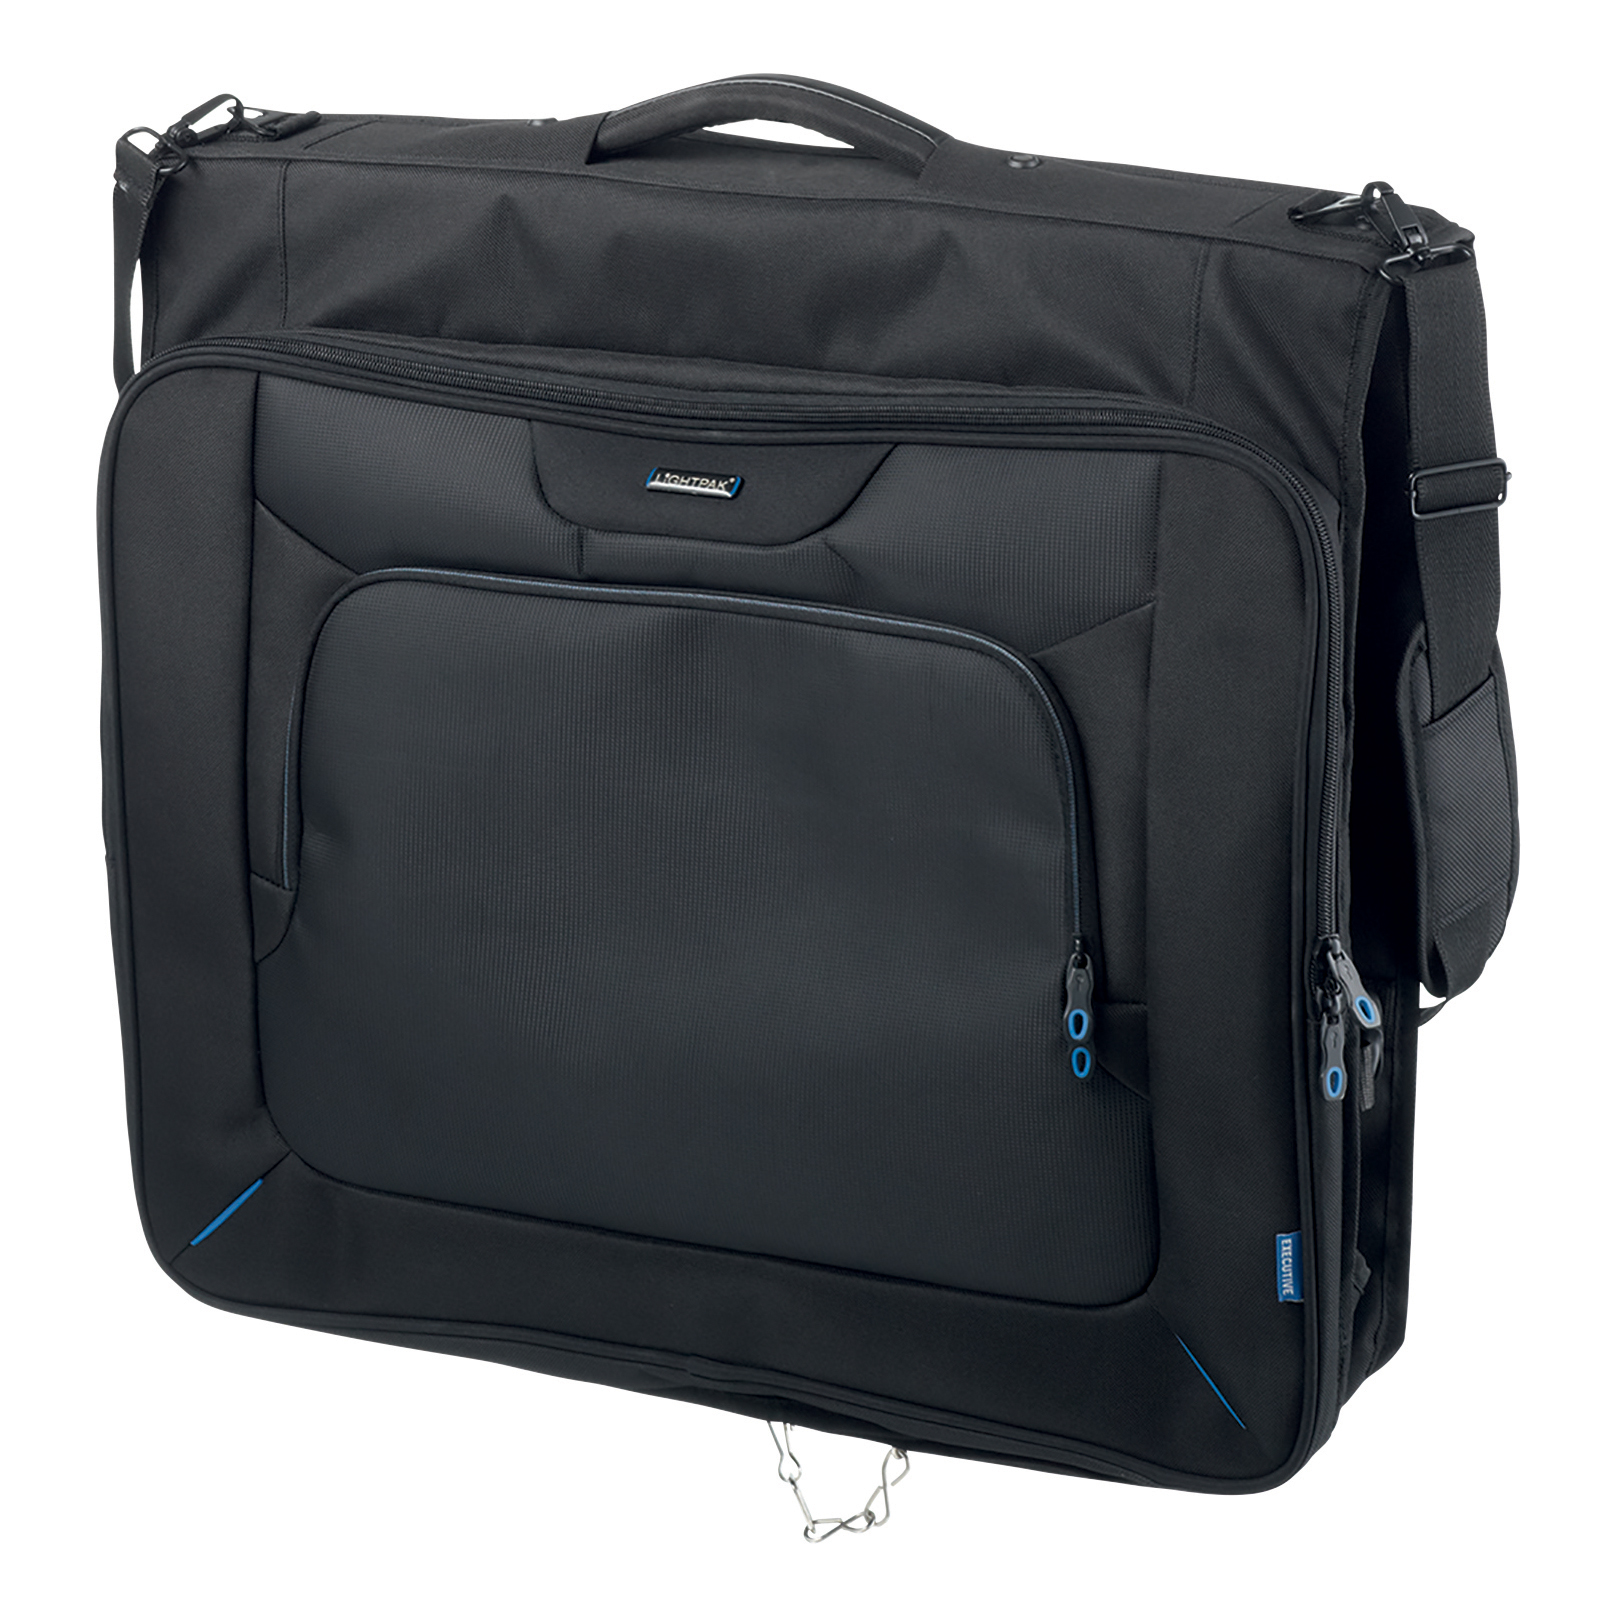 Lightpak Travel Garment Bag Main Compartment with Hanger Polyester Black Ref 46131